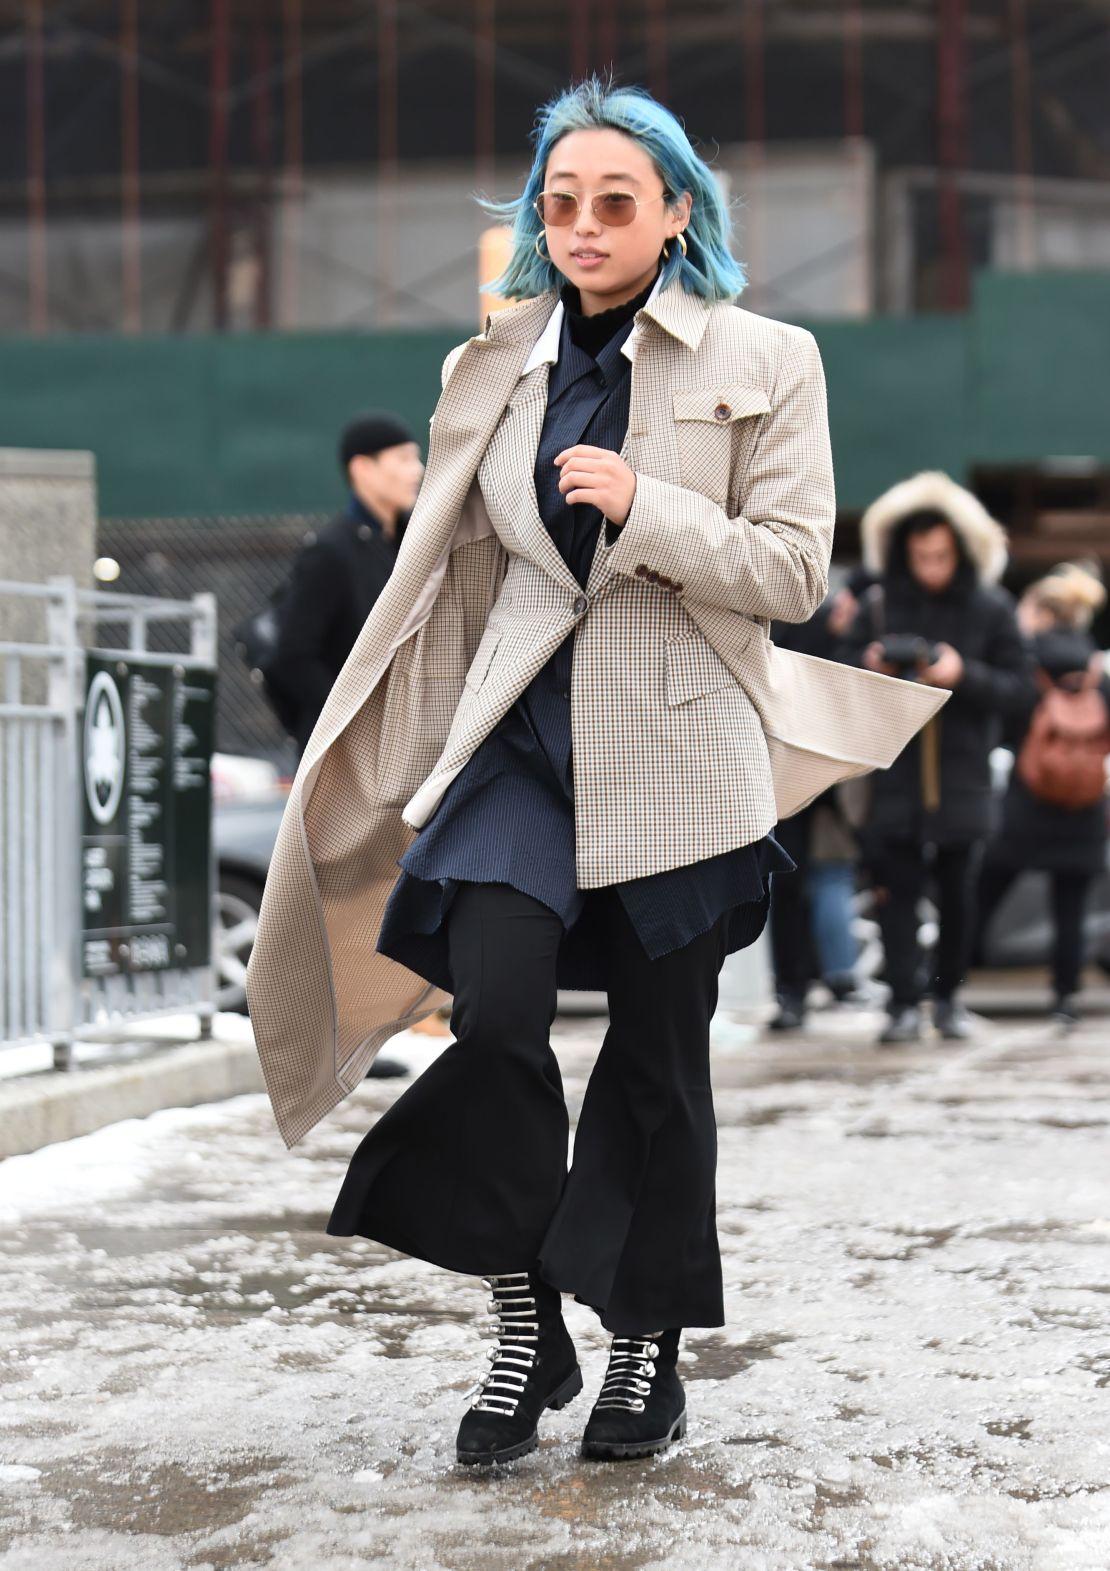 Street Style - New York Fashion Week February 2019 - Day 7